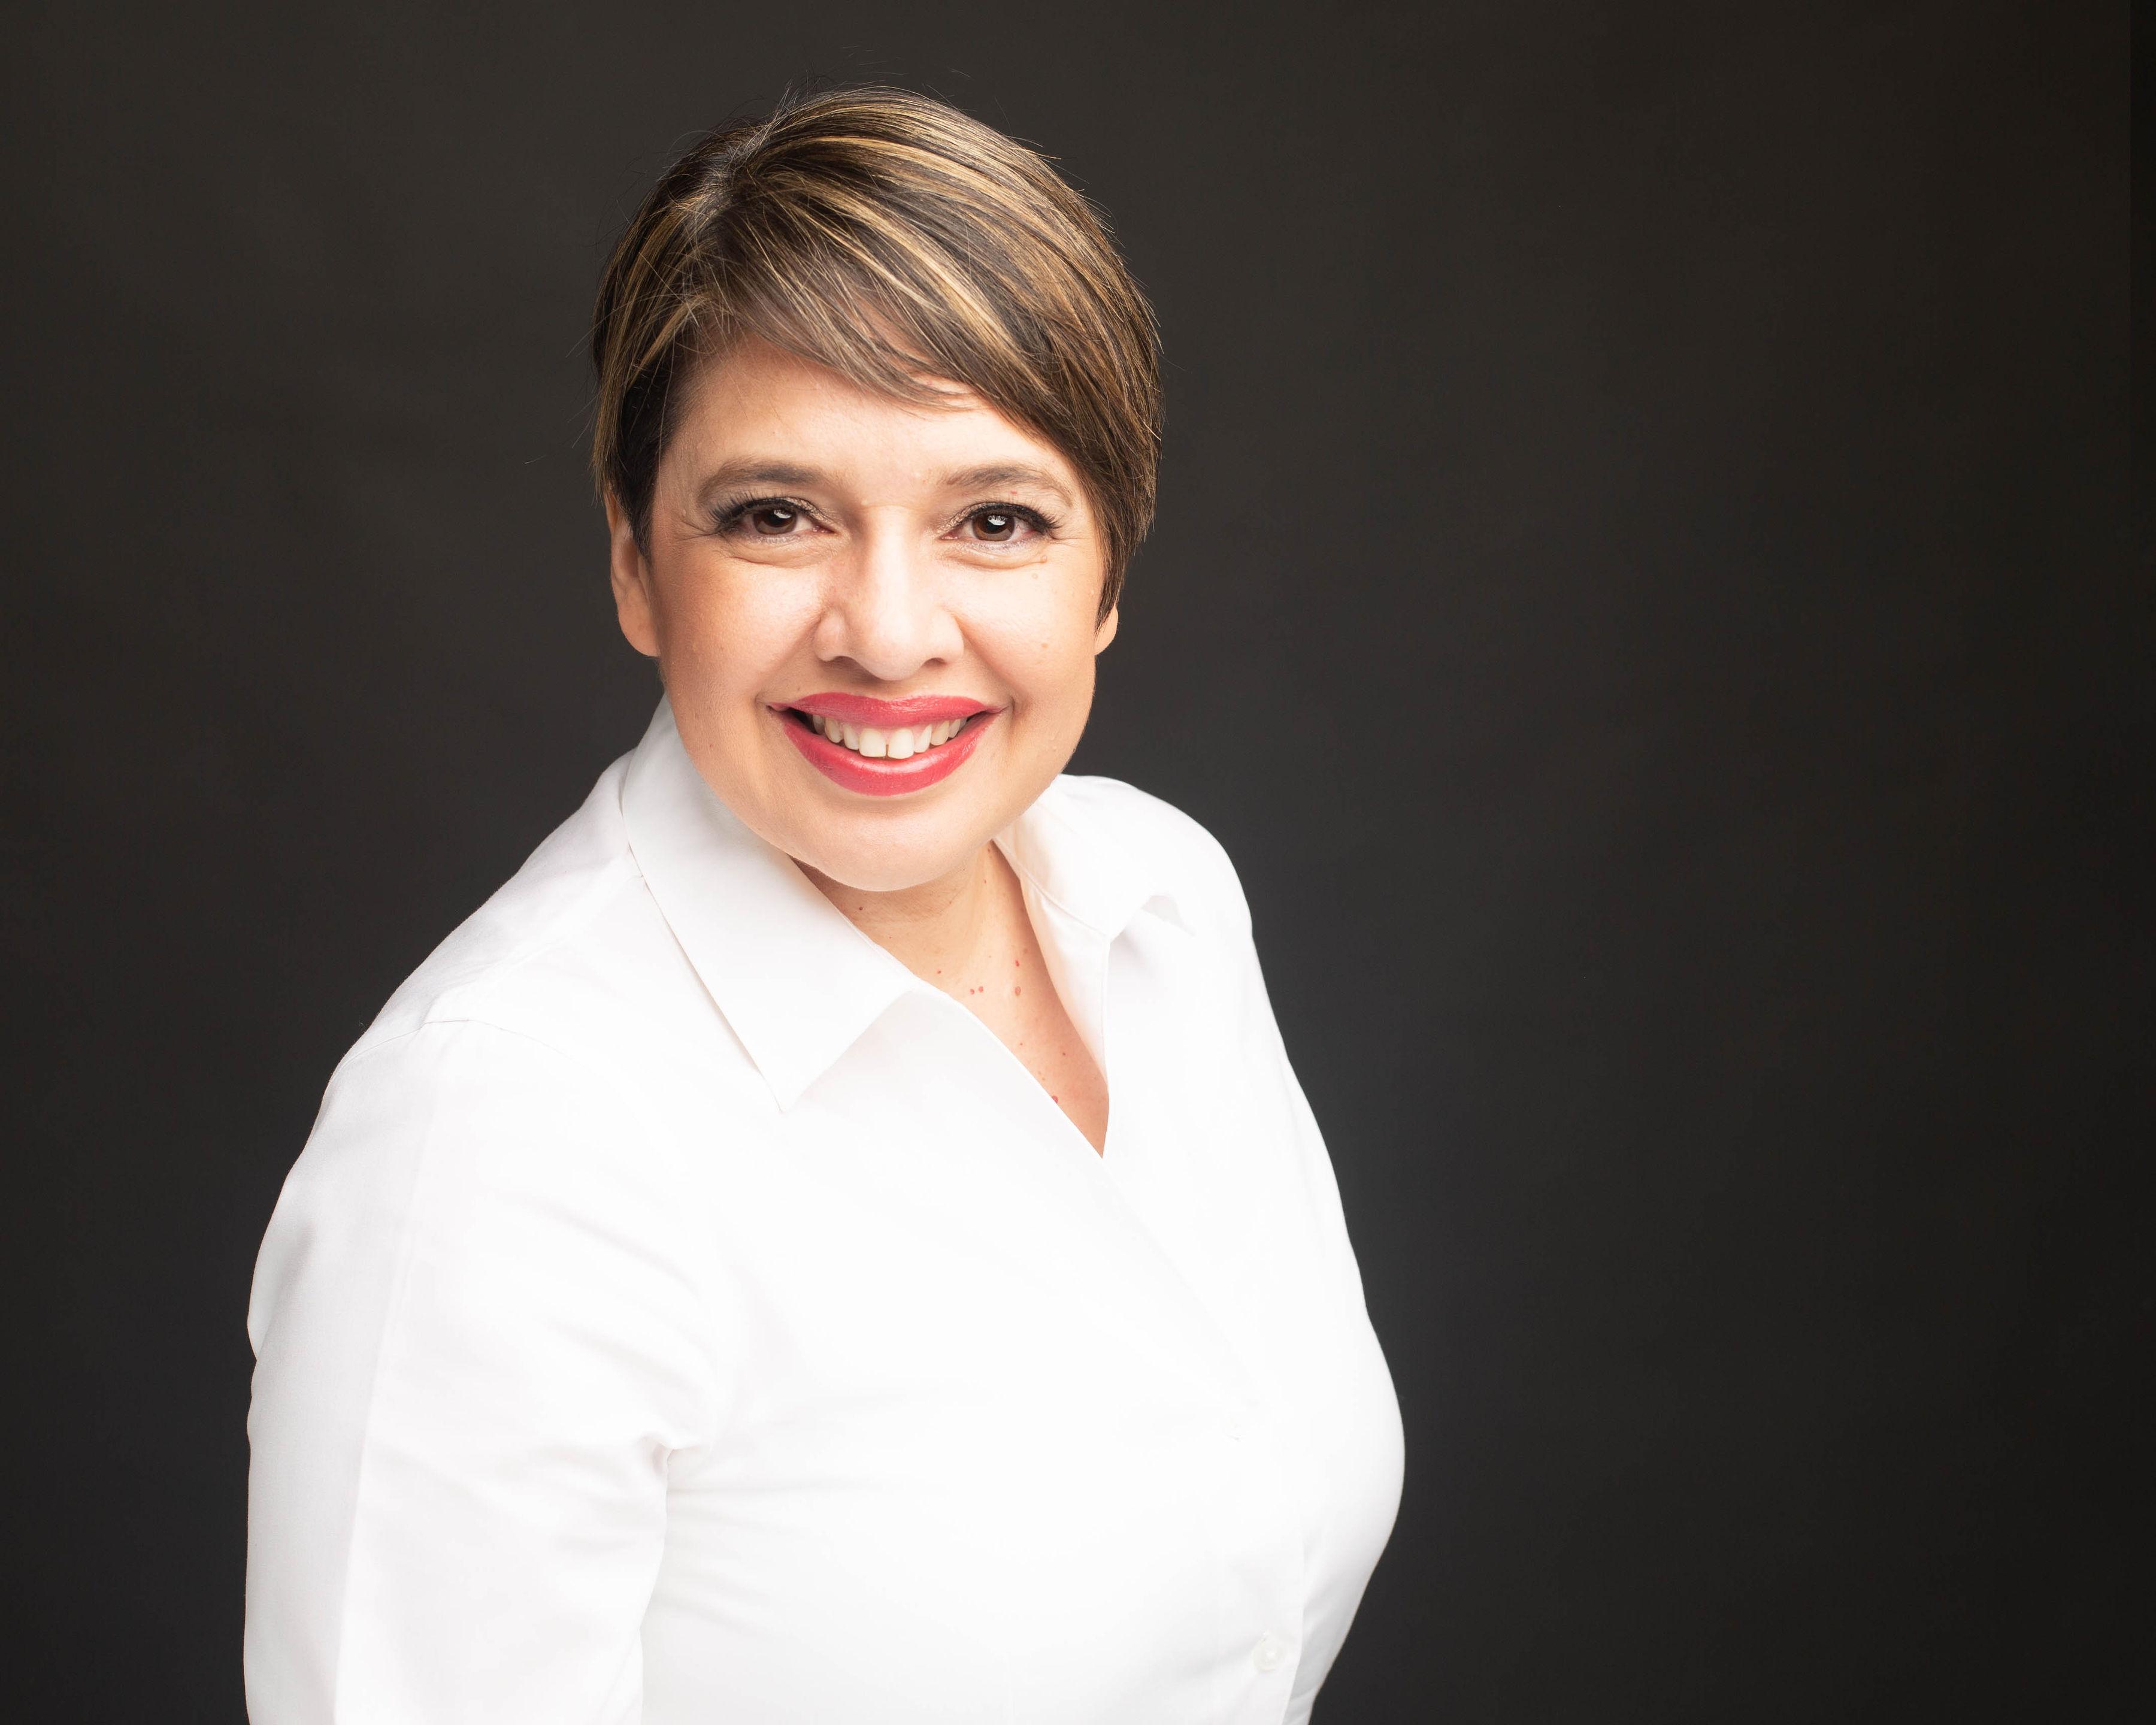 Jessica Calderón